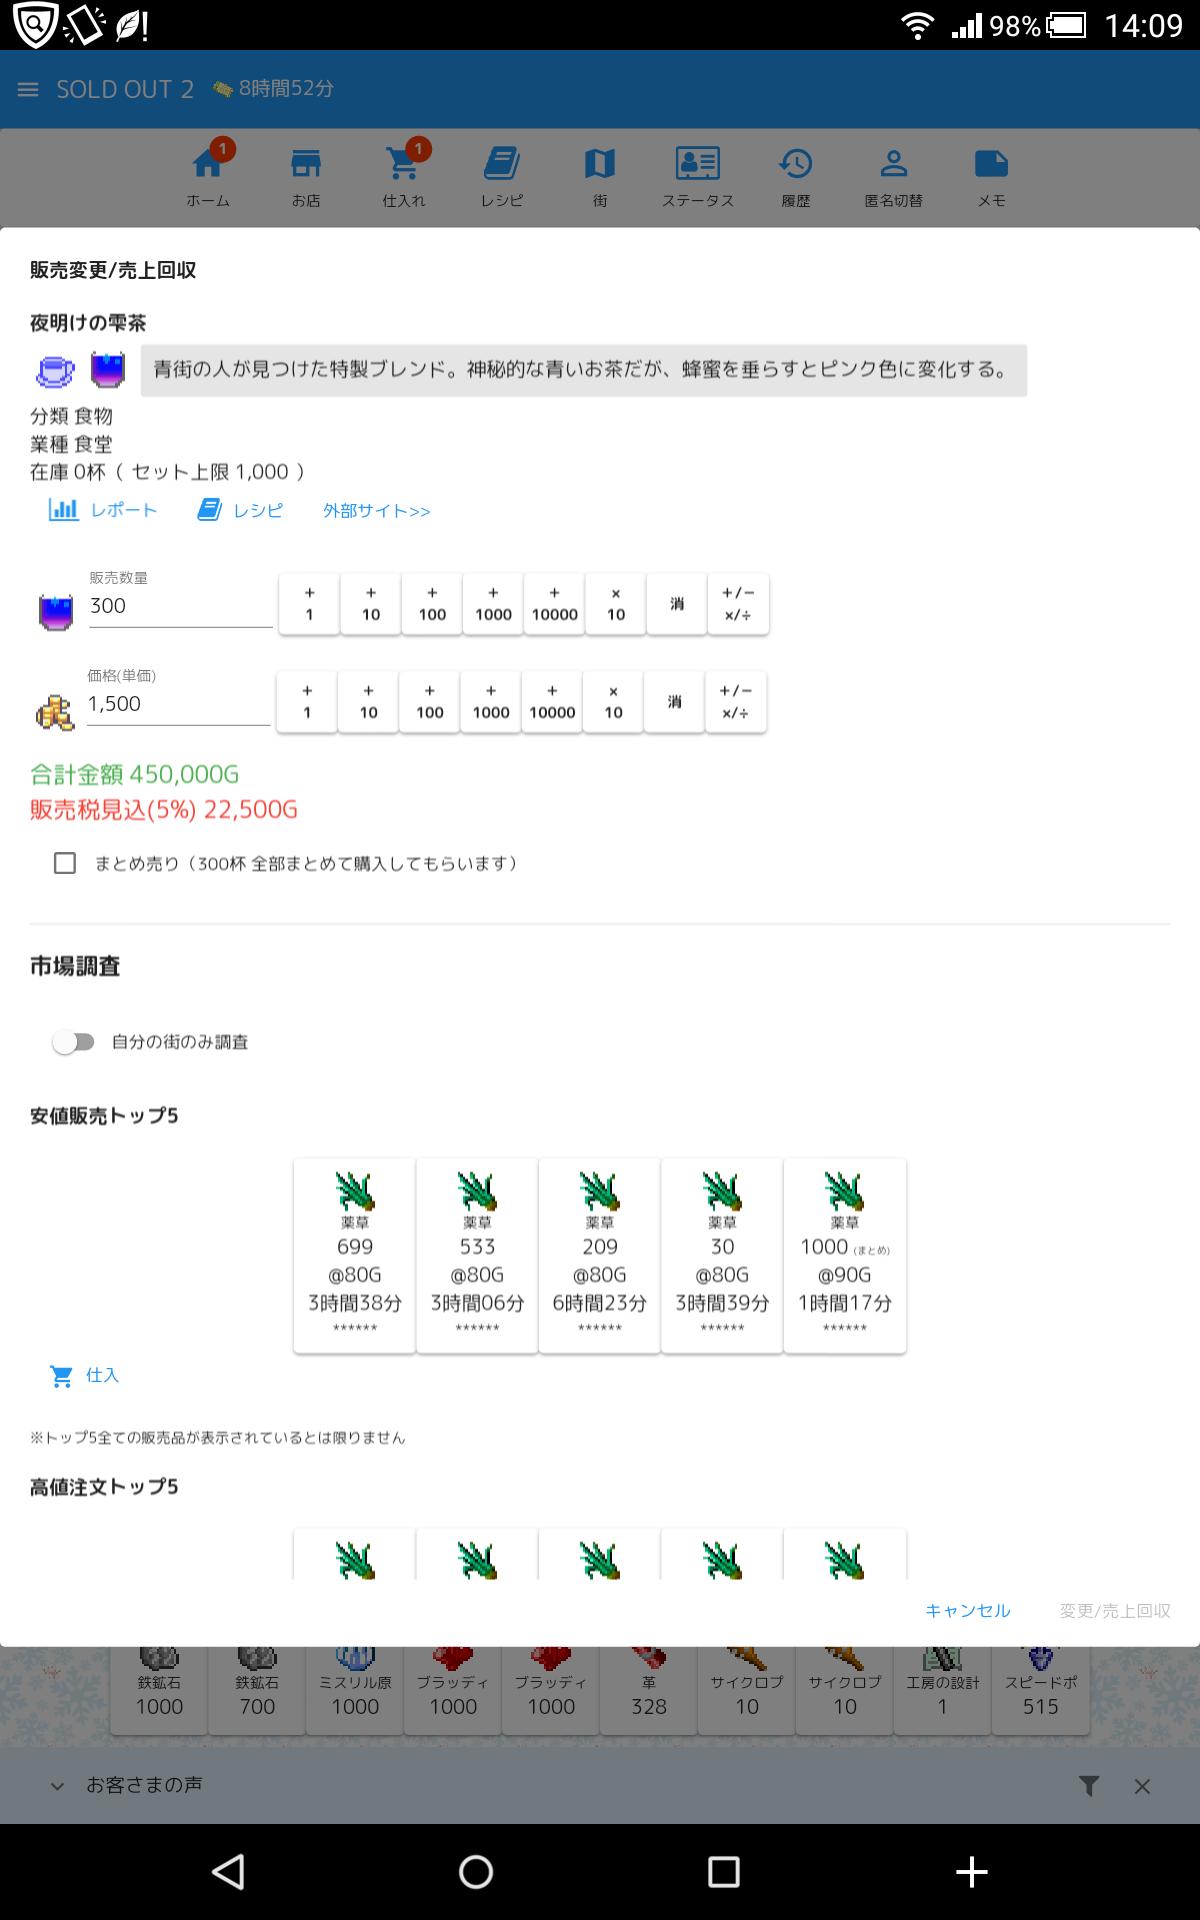 Screenshot_2018-12-09-14-09-47